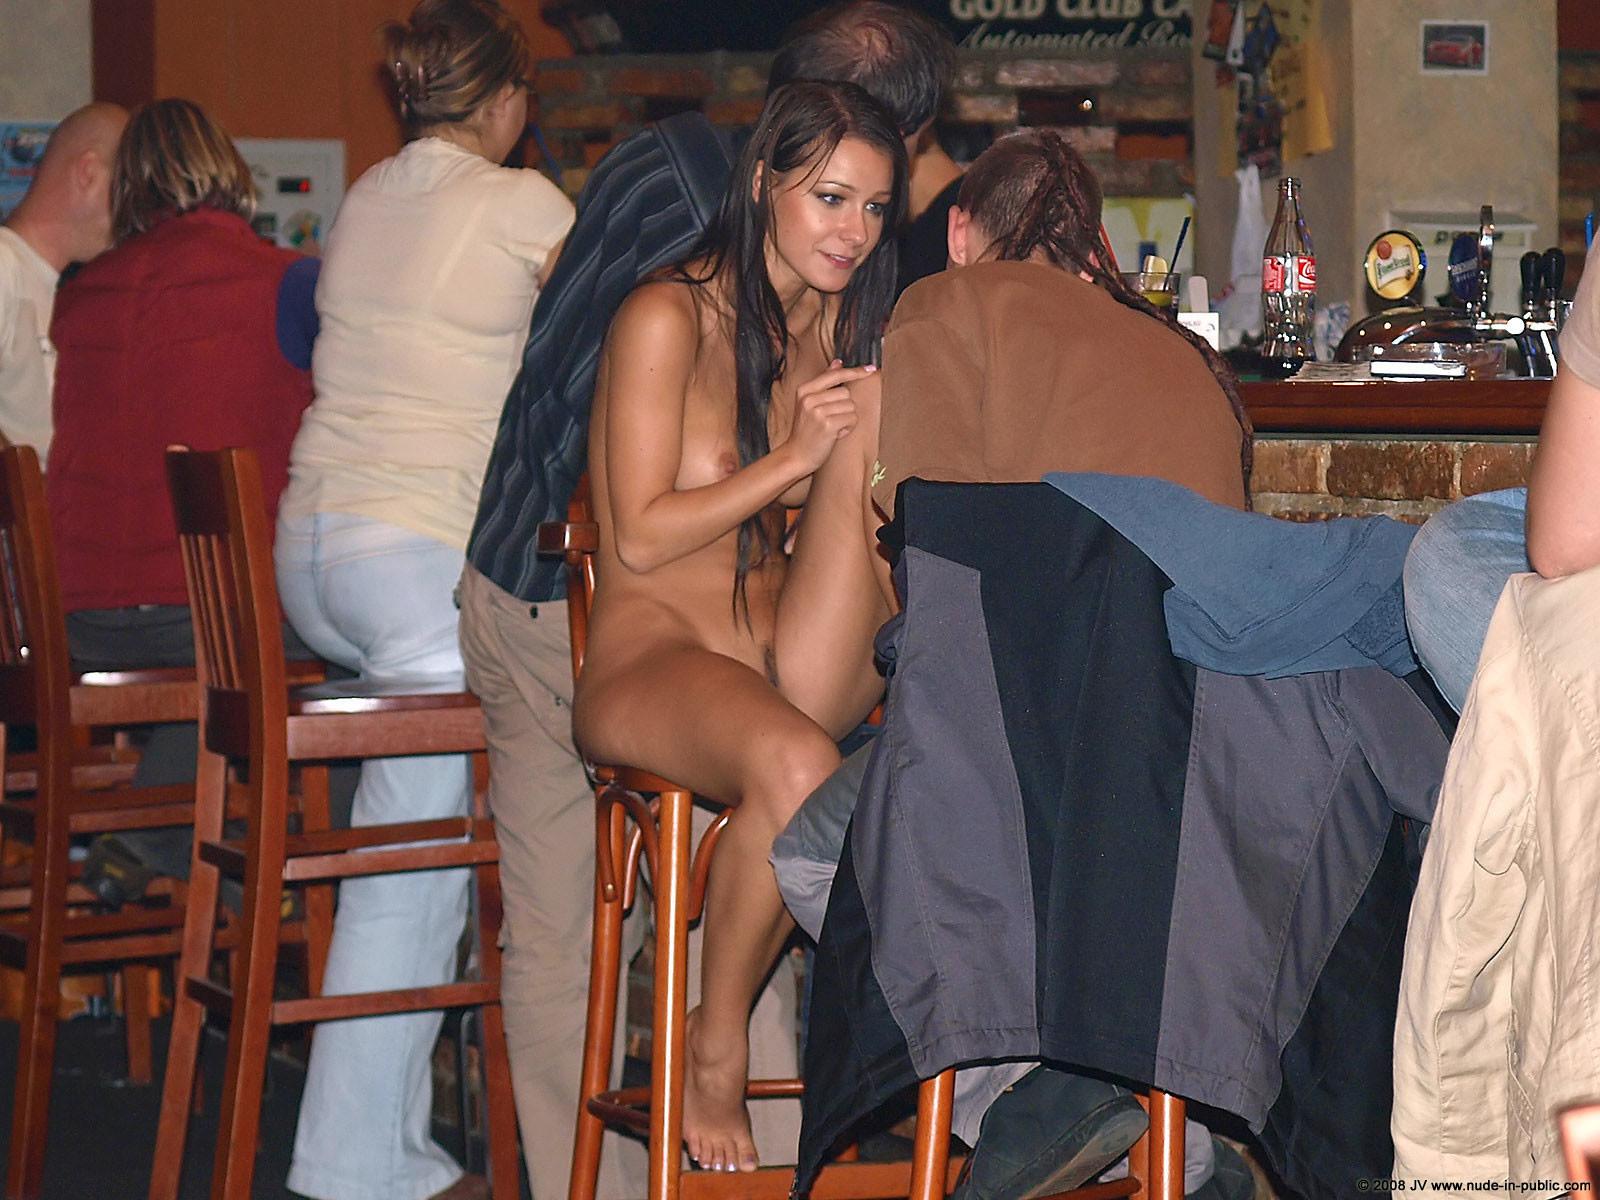 melisa-pub-beer-bar-girl-nude-in-public-90